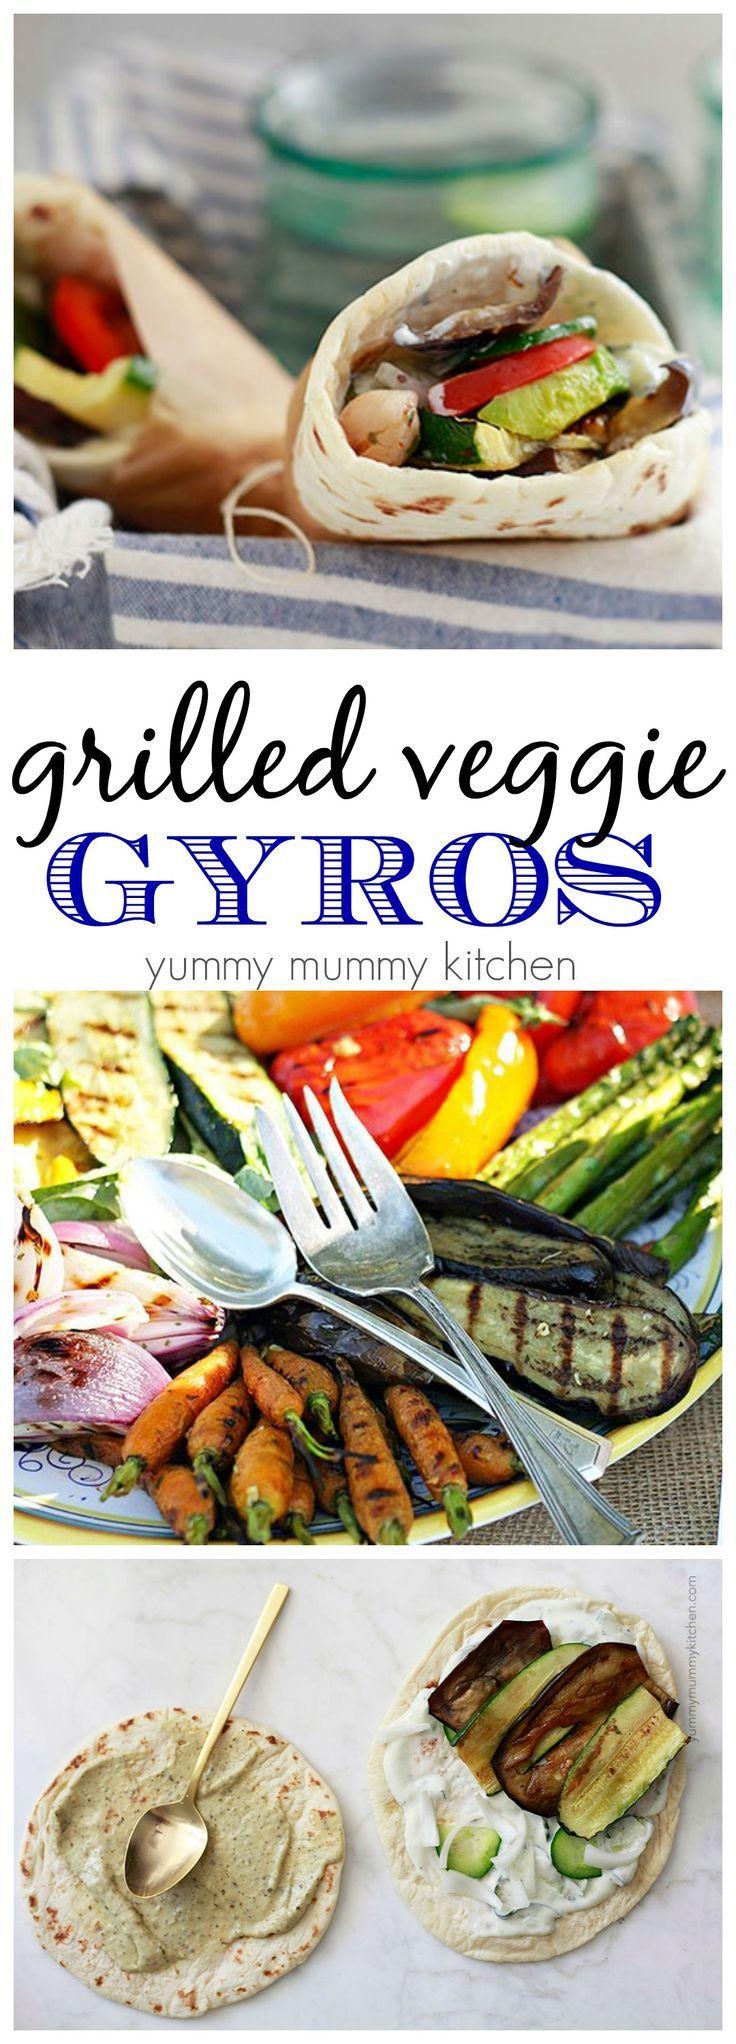 Grilled veggie gyros. I love this easy vegetarian or vegan lunch or dinner.